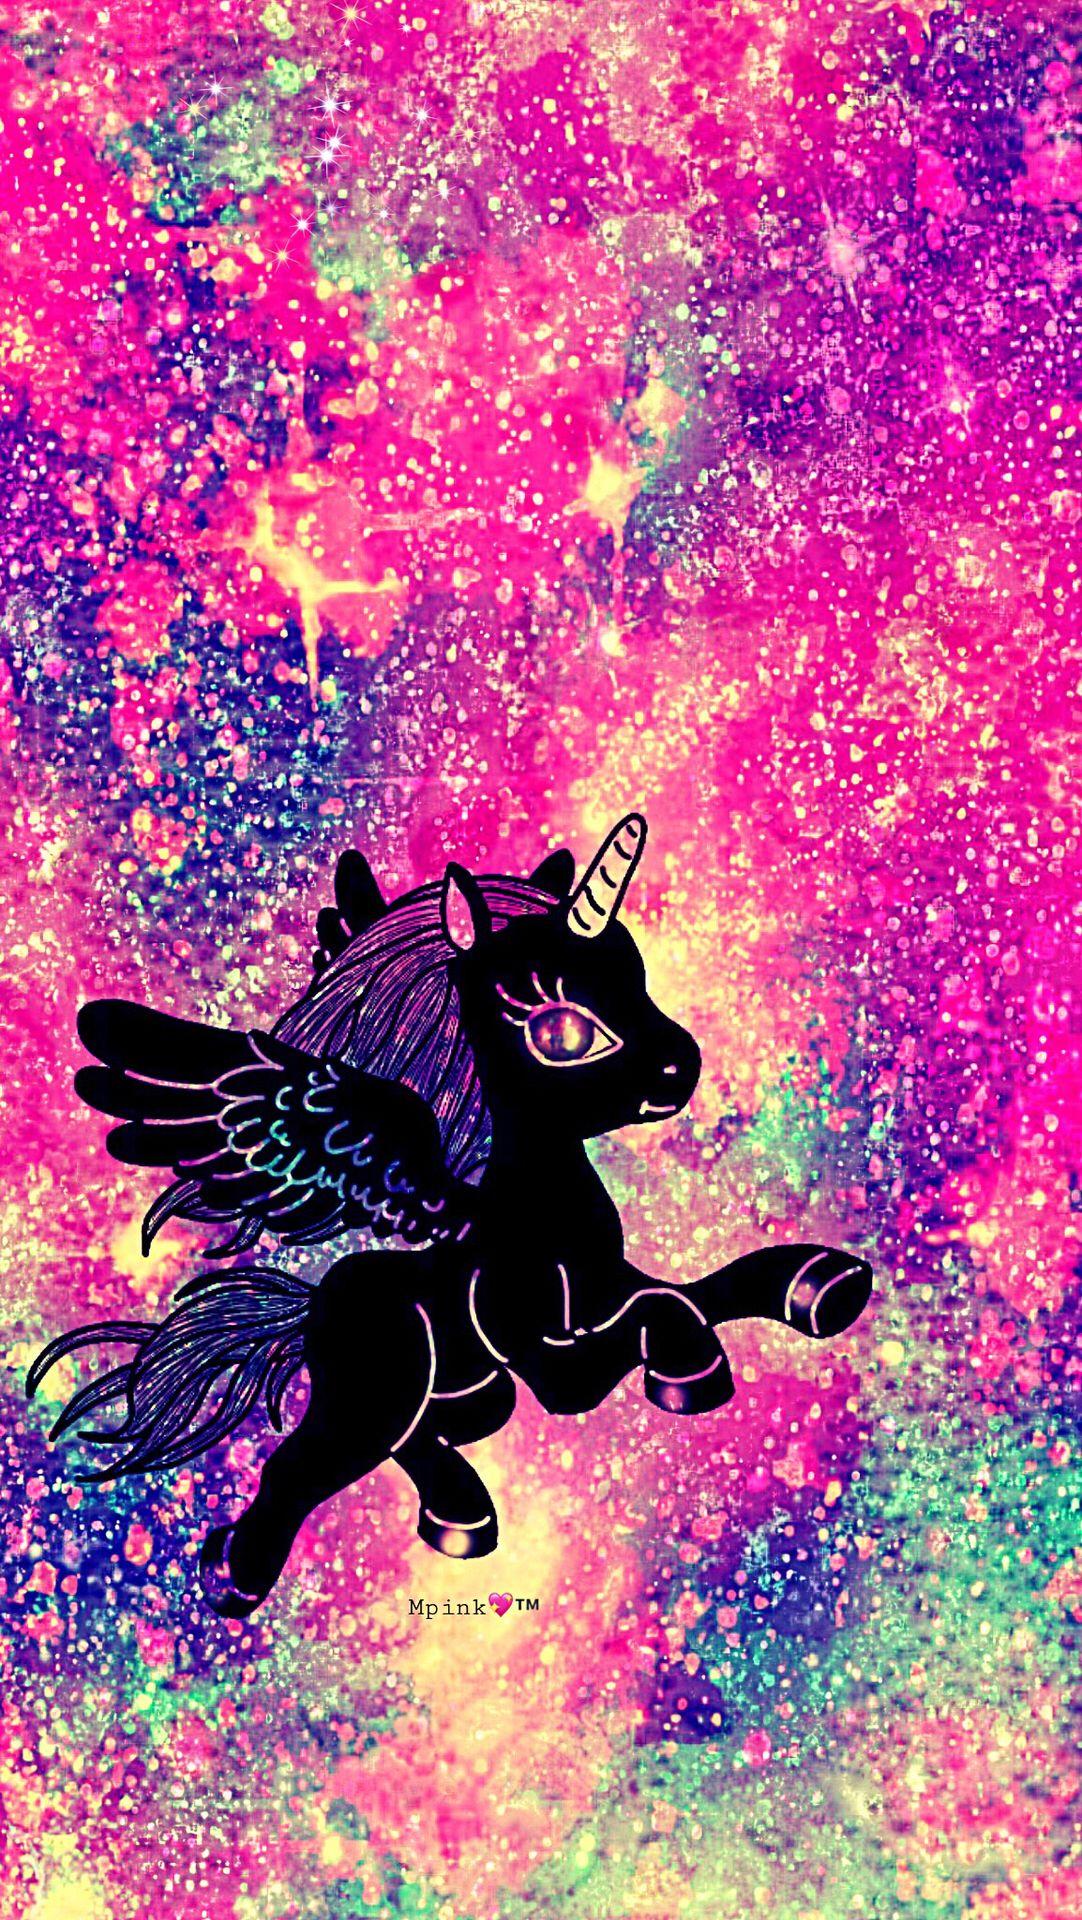 Rainbow Unicorn Galaxy Wallpaper Androidwallpaper Iphonewallpaper Wallpaper Galaxy Sparkle Glitter Lockscreen Pretty Pink Cute Girly Unicorn